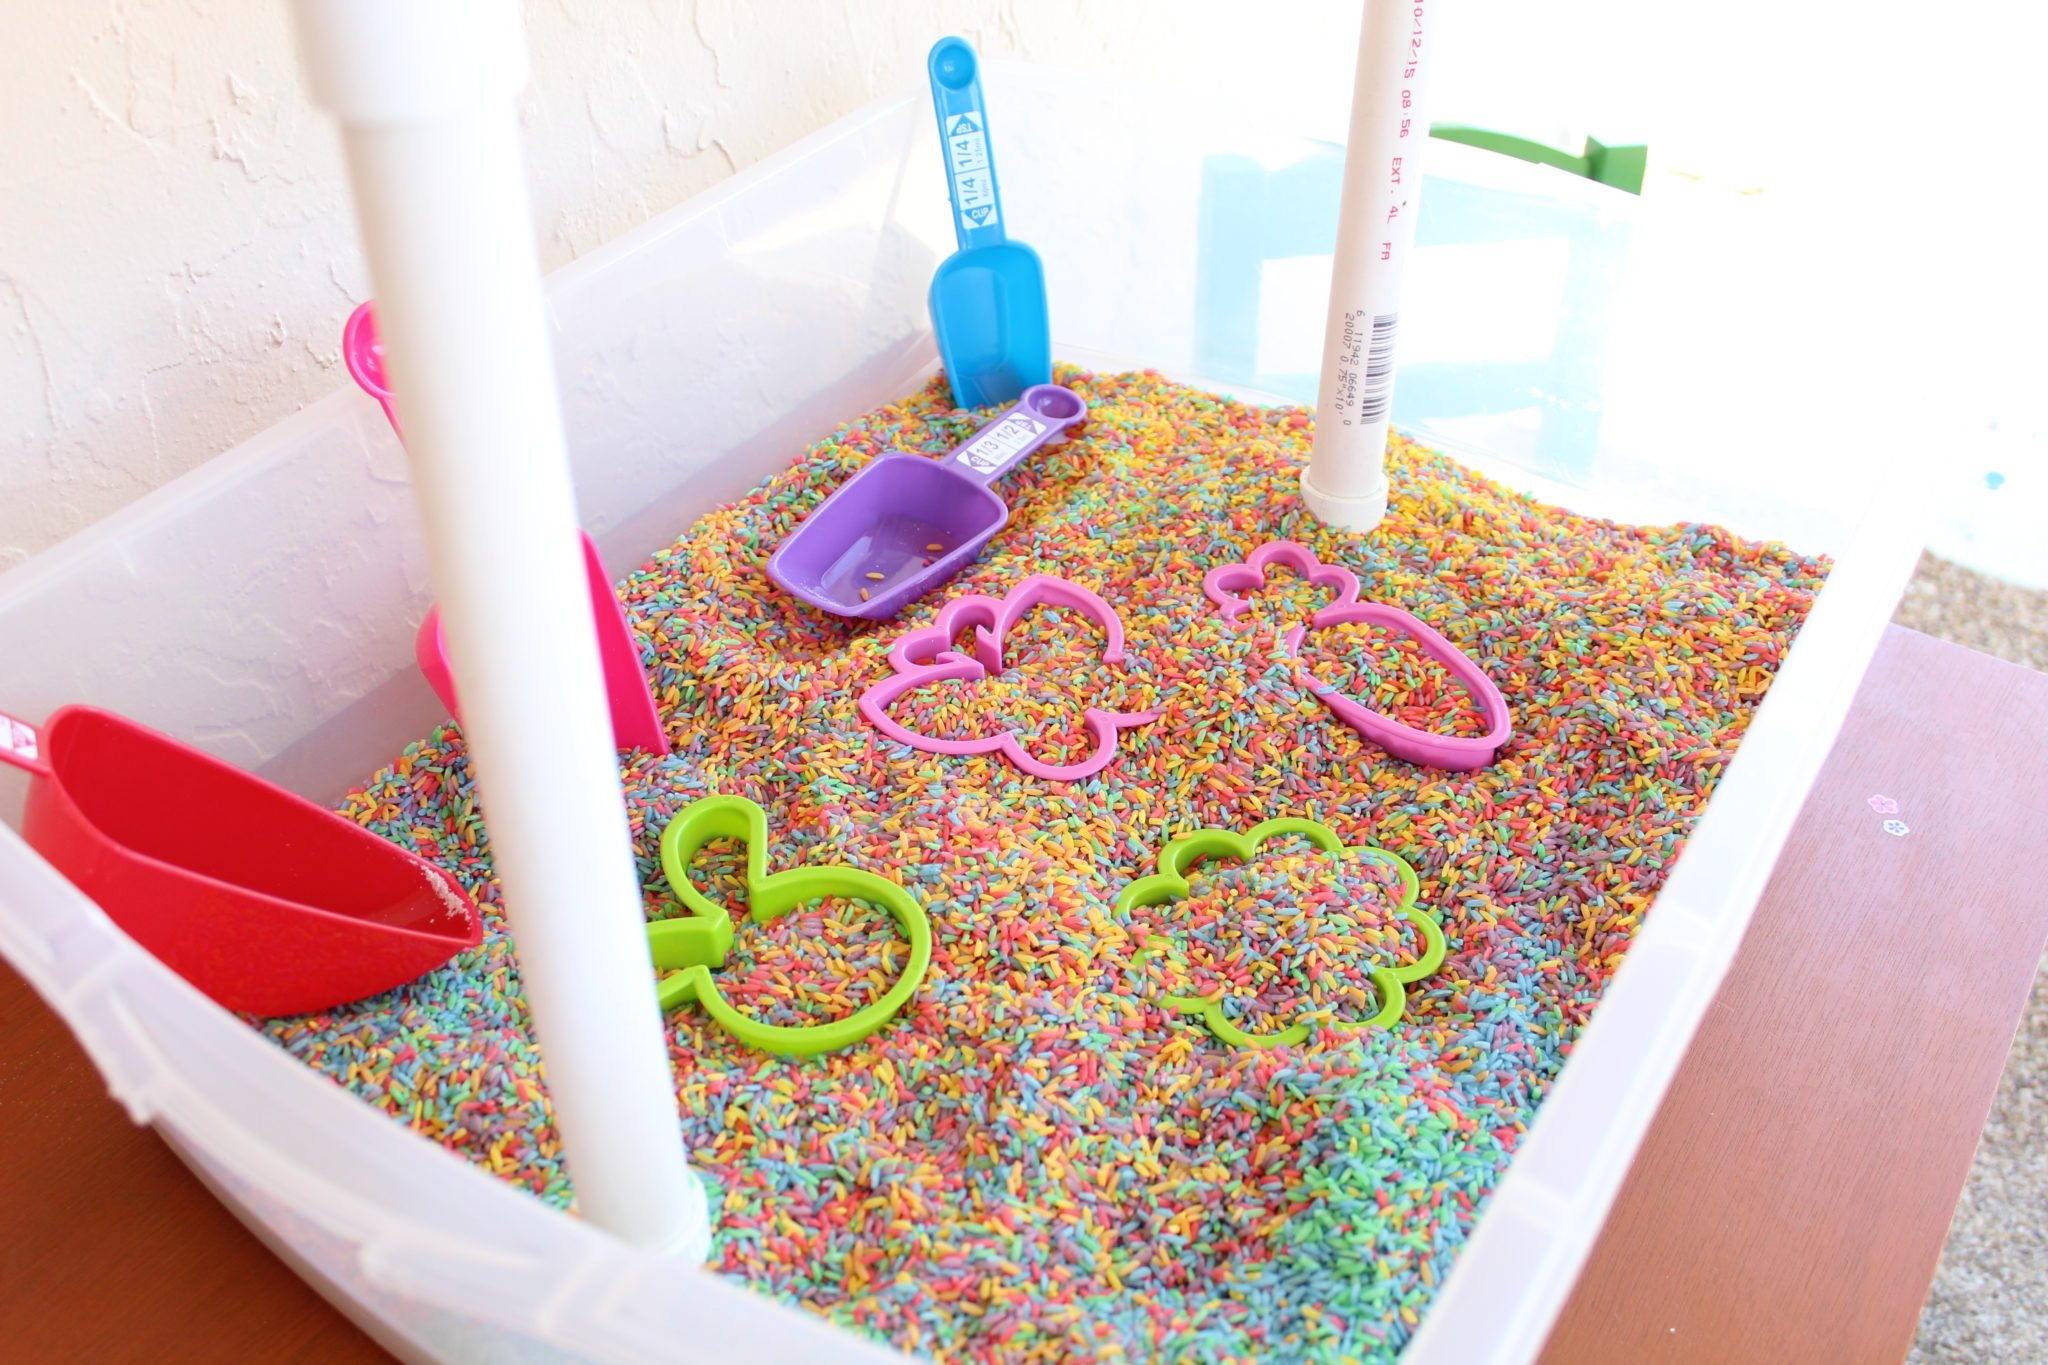 Rainbow Rice Sensory Bin for Toddlers